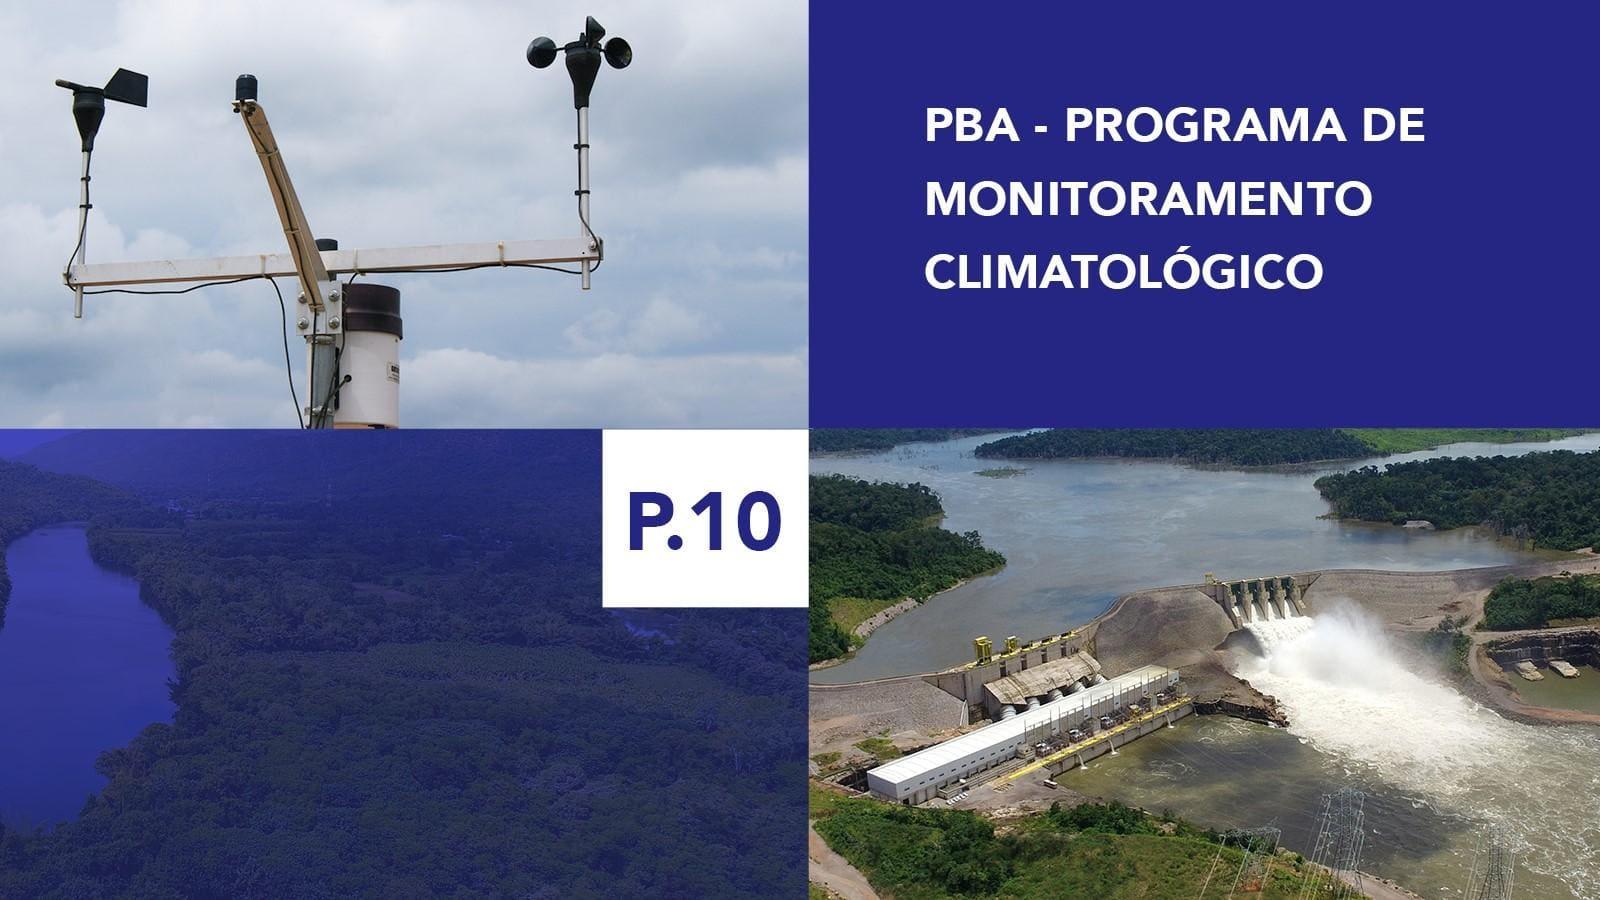 P.10 - Programa de Monitoramento Climatológico